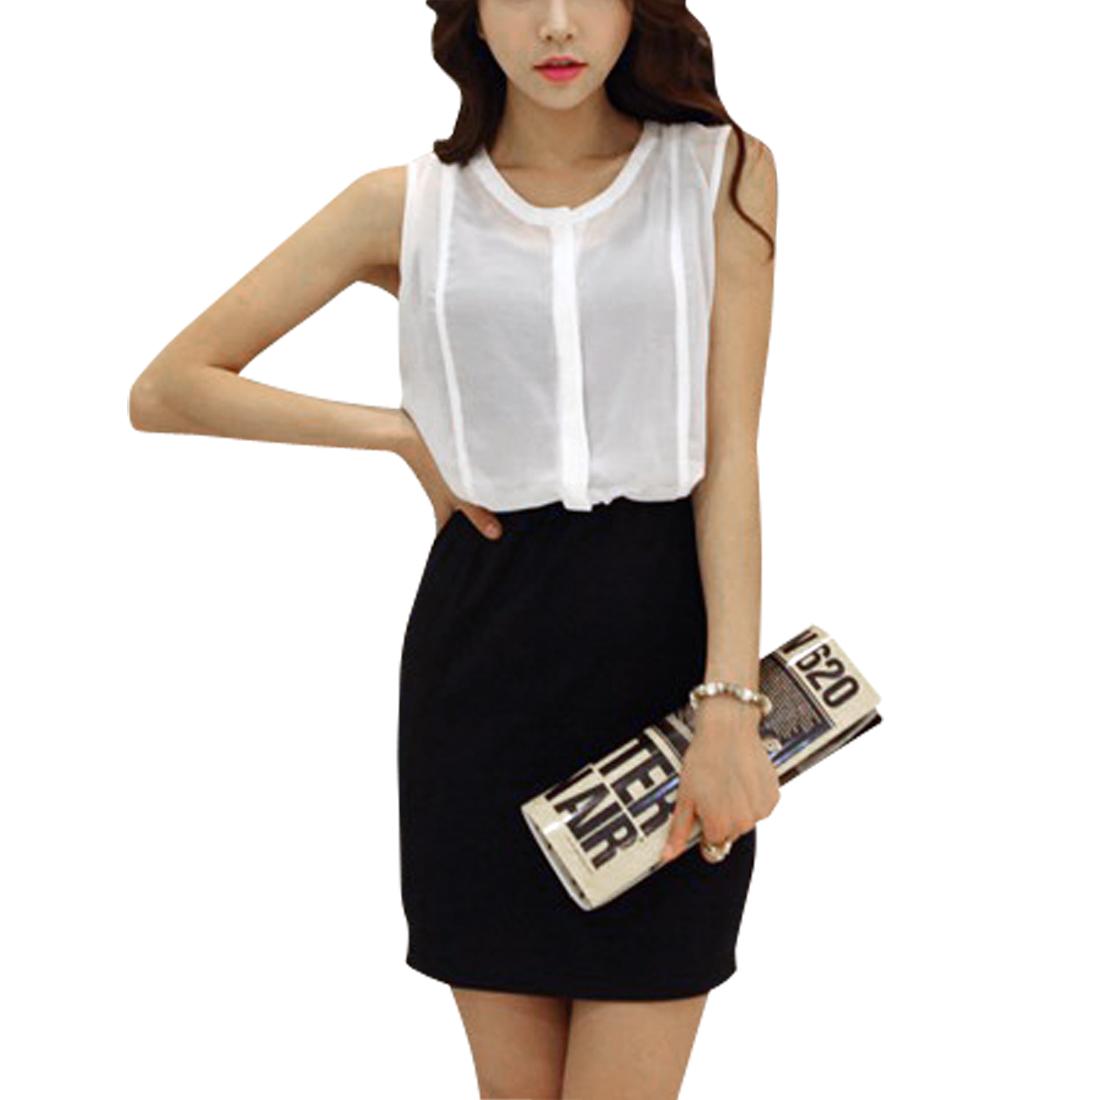 Lady Button Up Hidden Sleeveless Hip Tight Black White Mini Dress XS